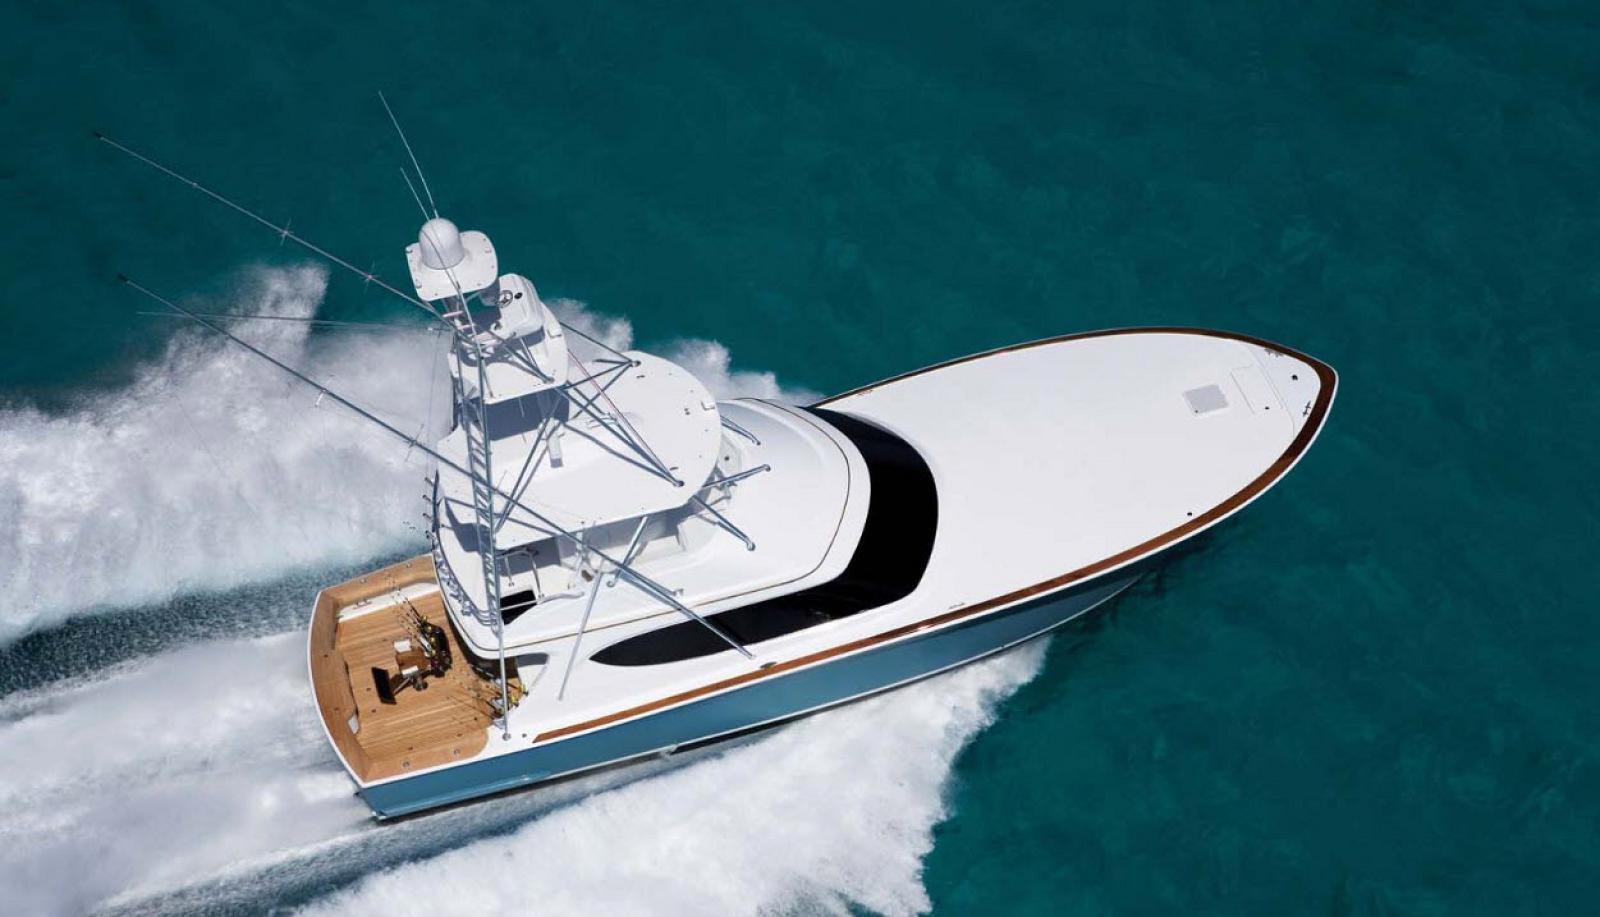 Kasten Boat Design